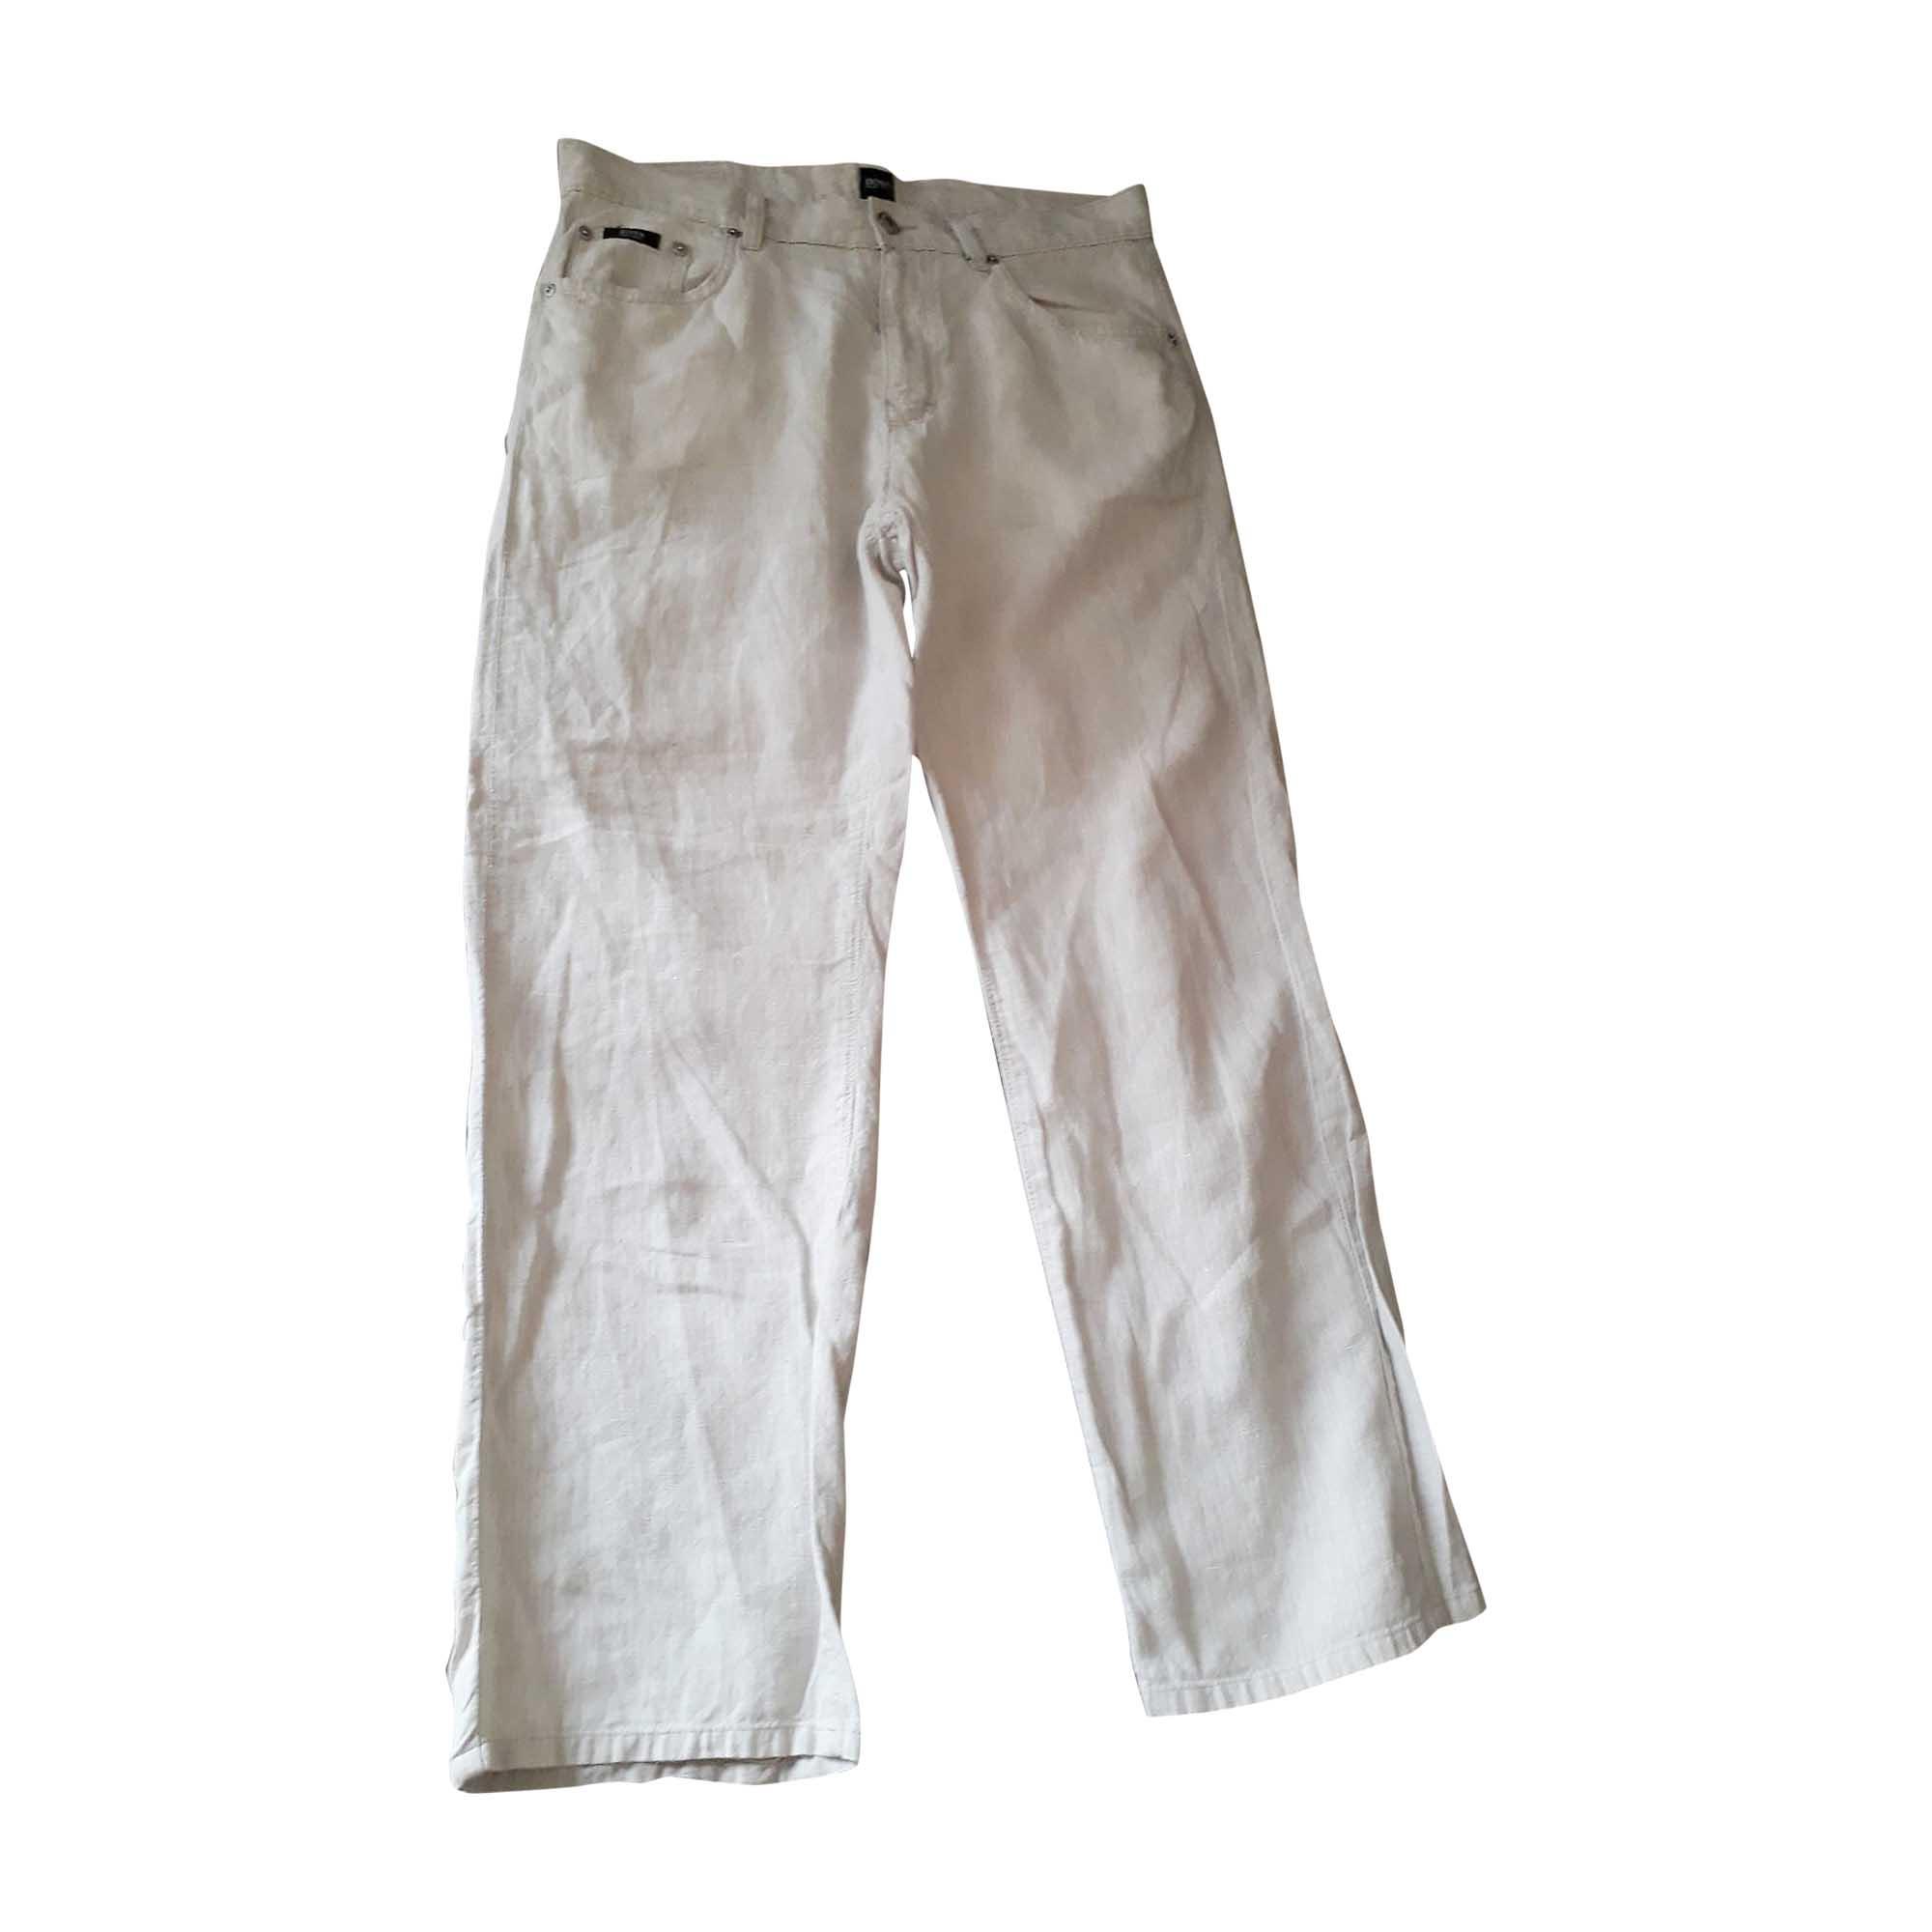 Pantalon droit HUGO BOSS Blanc, blanc cassé, écru